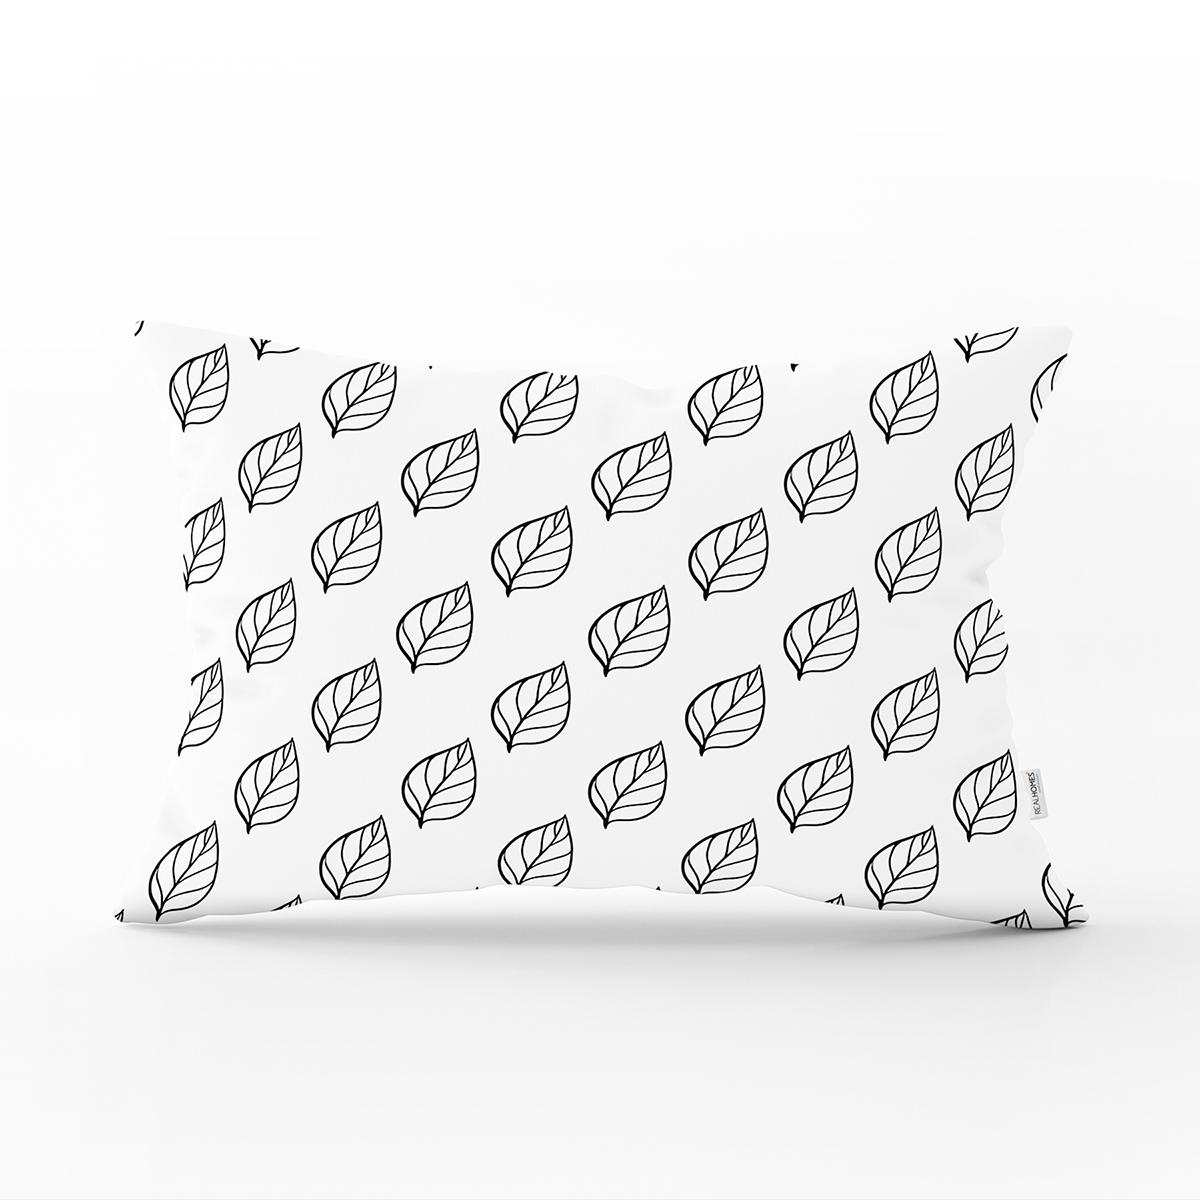 Siyah Beyaz Yaprak Motifli Modern Dikdörtgen Yastık Kırlent Kılıfı Realhomes